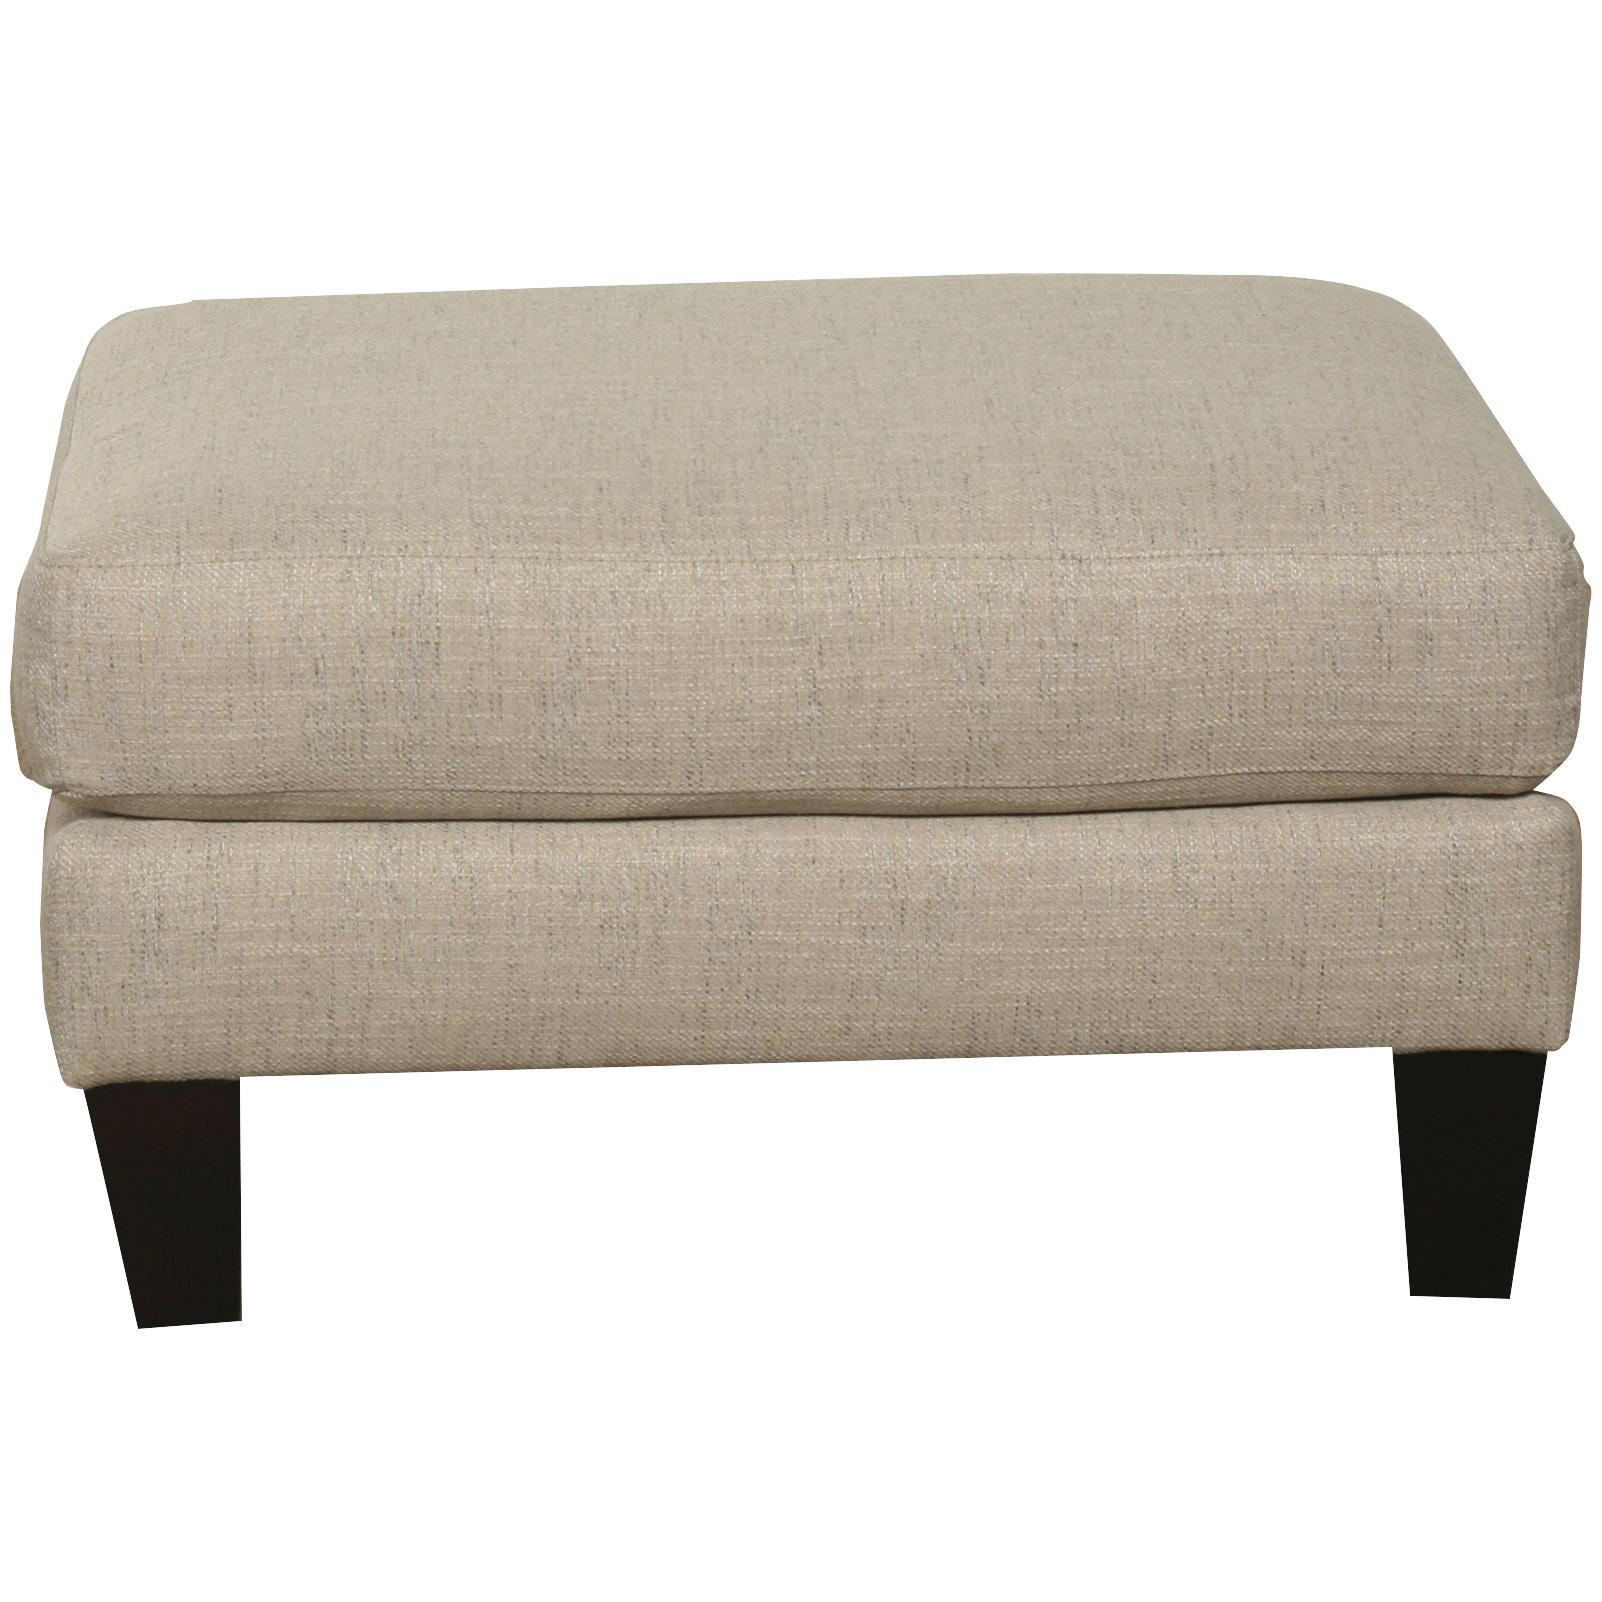 Bauhaus Furniture   Solo Burlap Ottoman